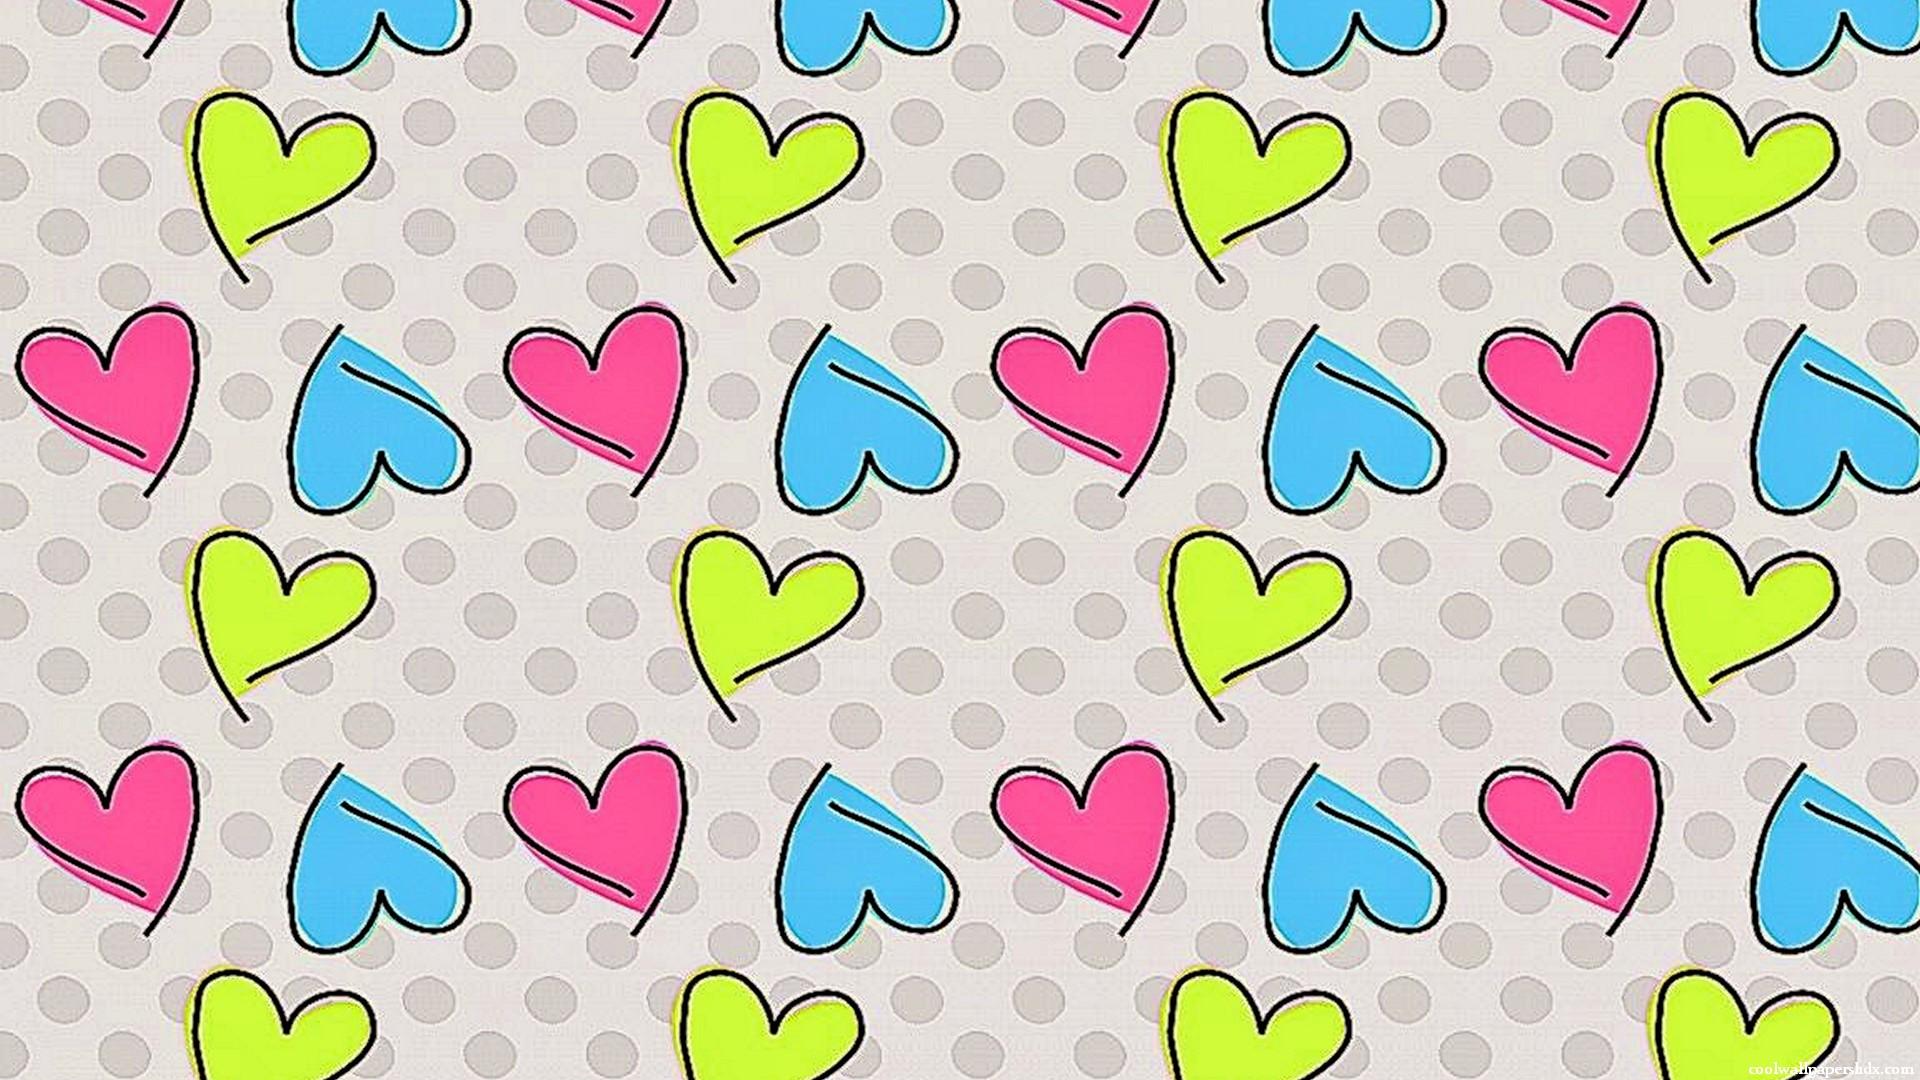 Hd Wallpapers Cute Girly Desktop Wallpaper Pink Anime Wallpaper